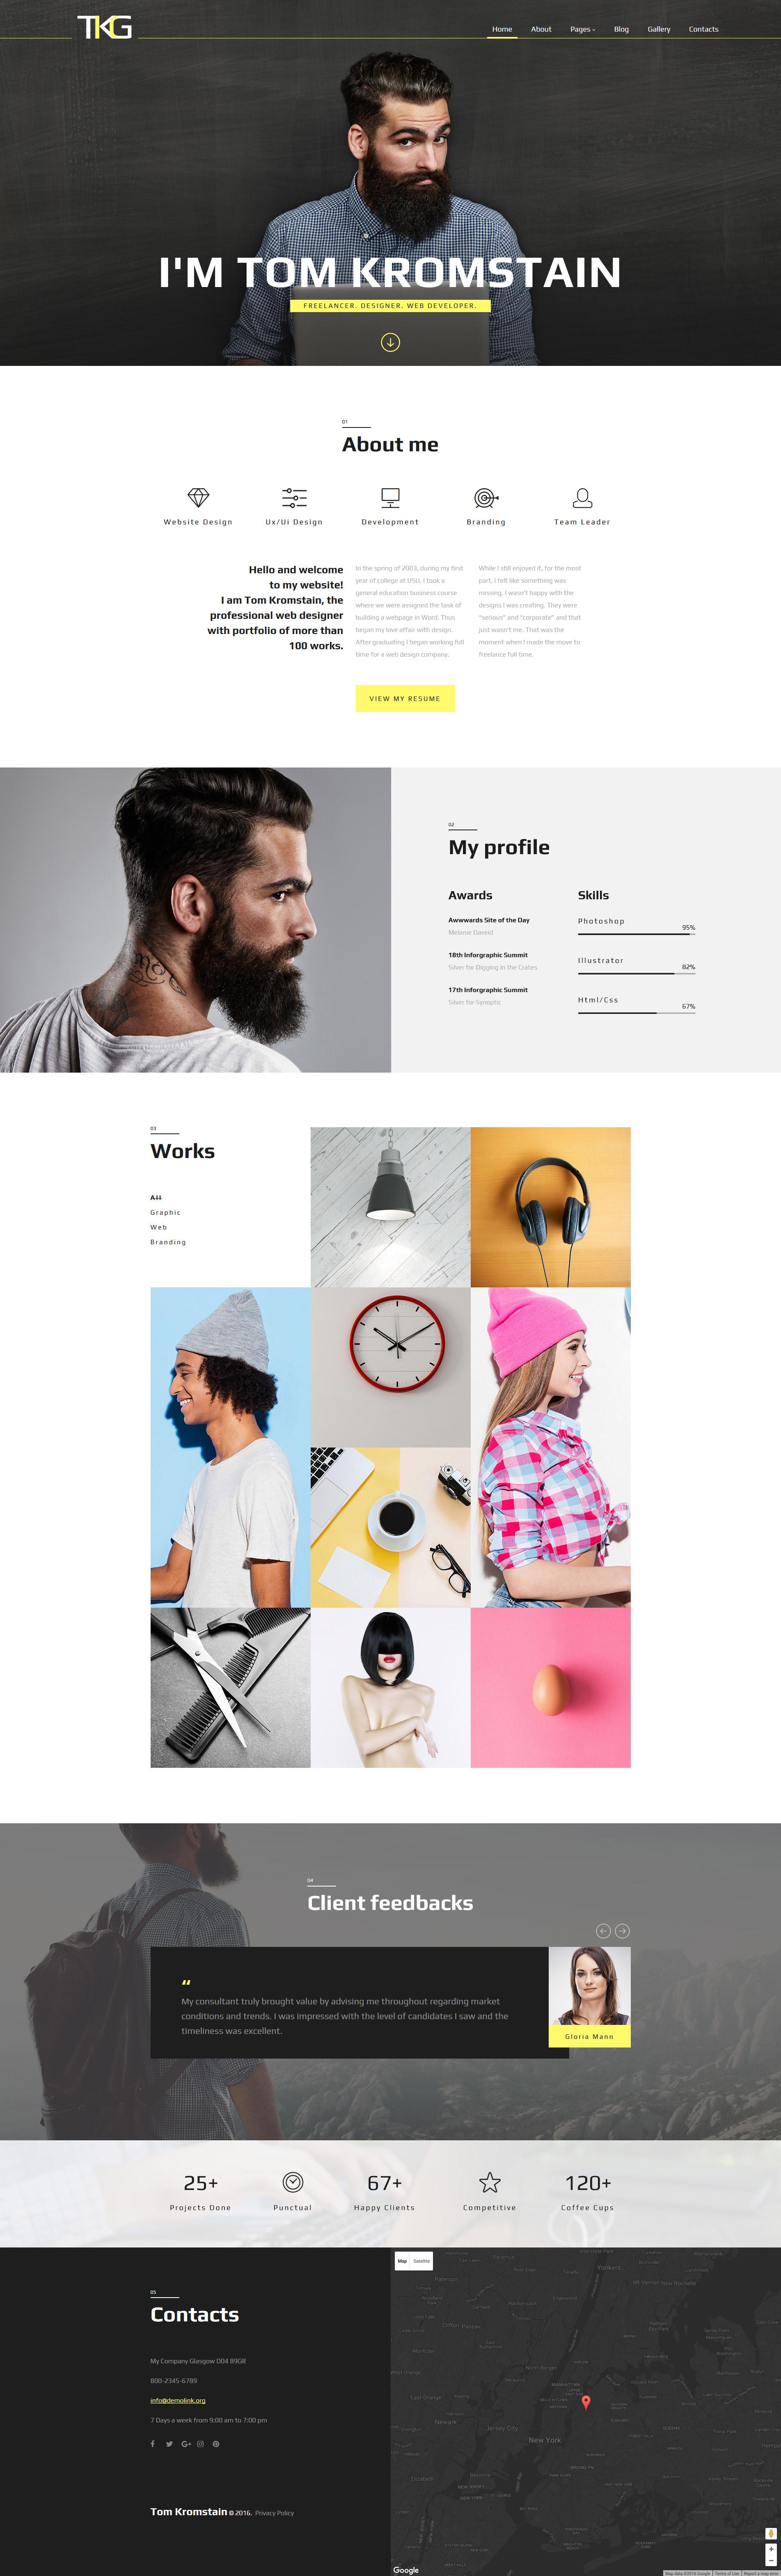 Joomla tshirt design - Tkg Responsive Joomla Template